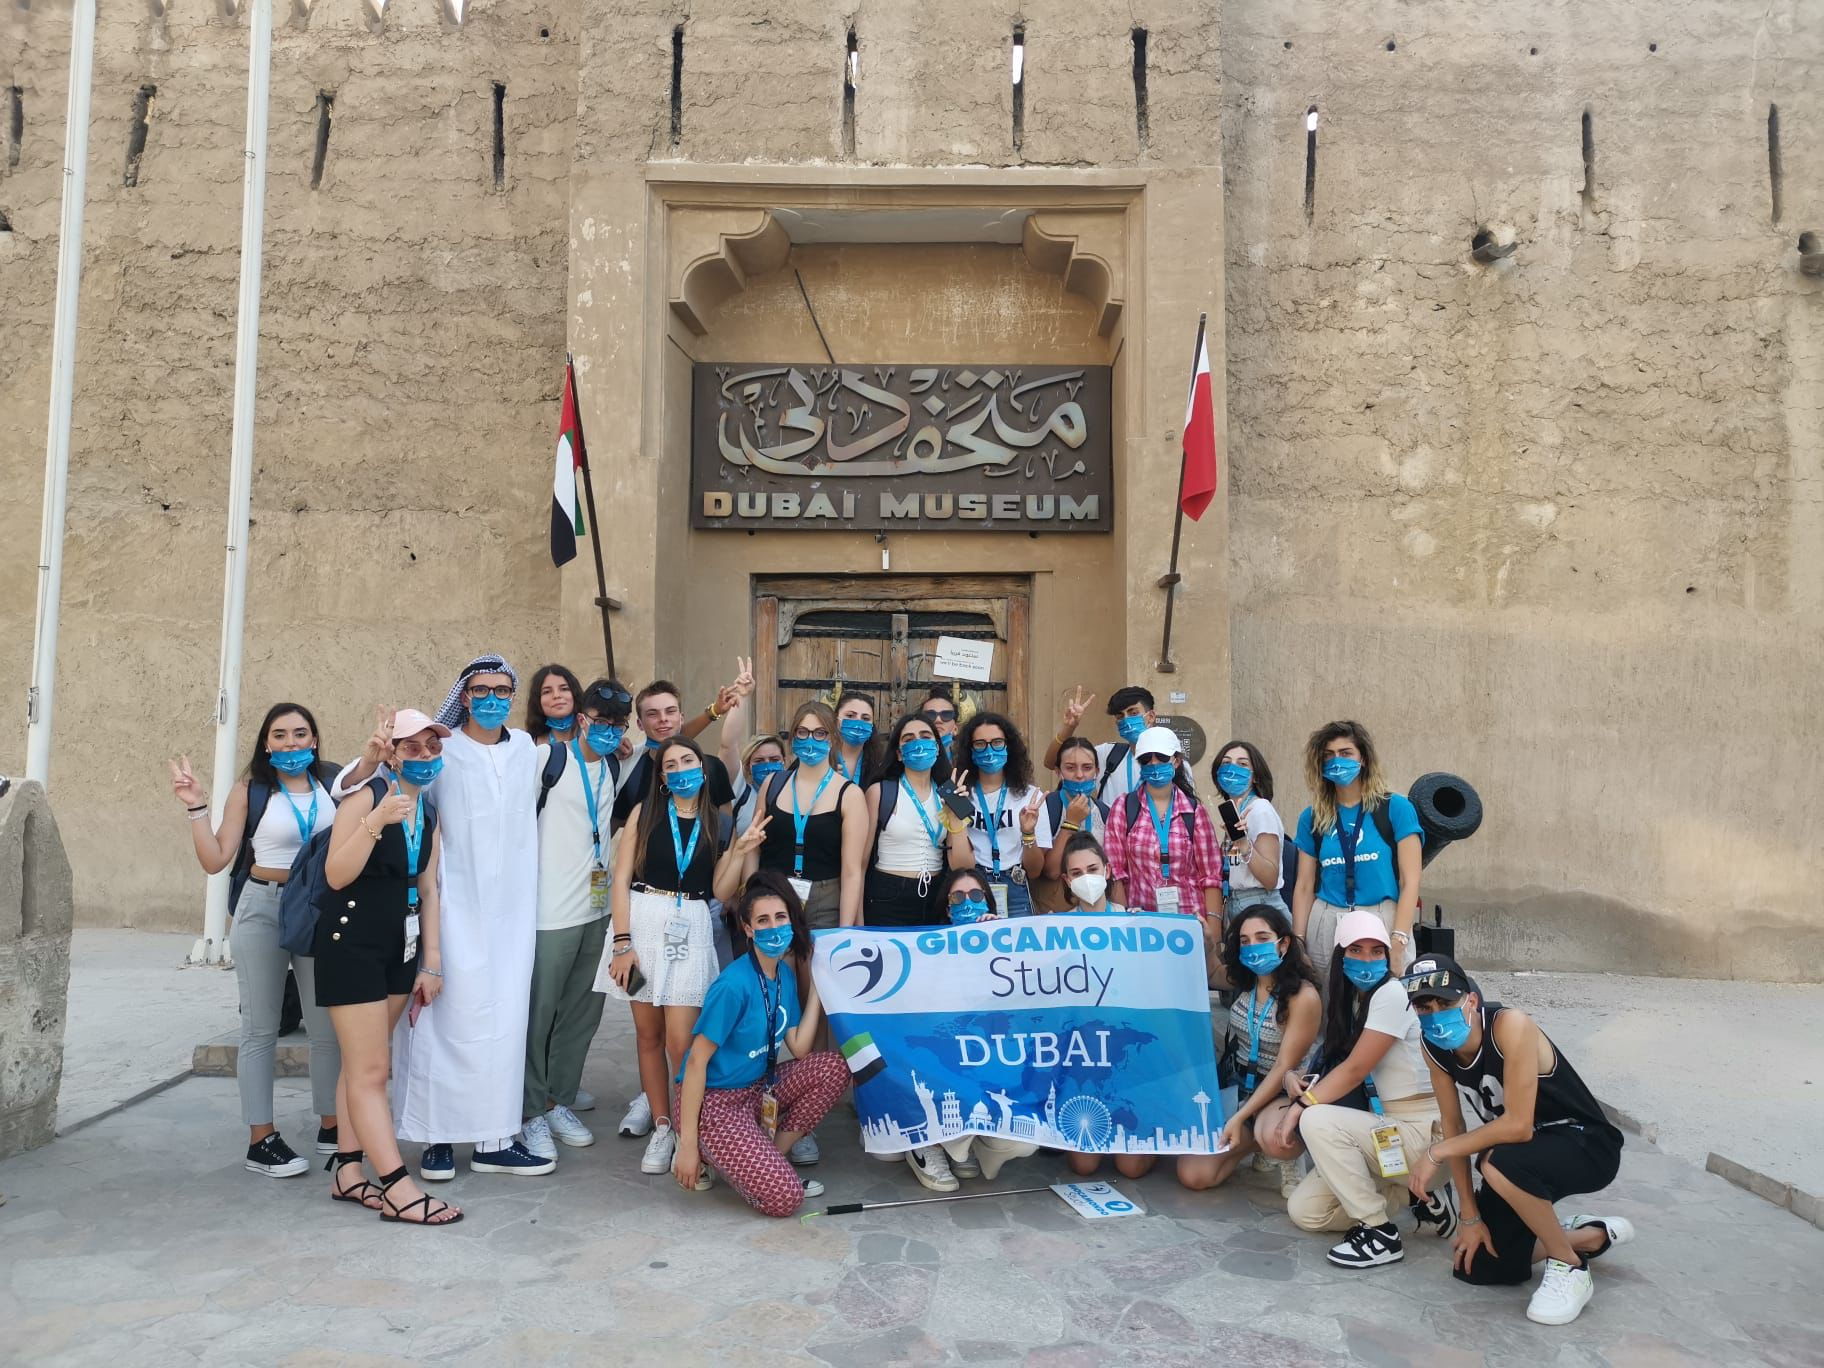 Emirati Arabi Archivi - Giocamondo Study-WhatsApp-Image-2021-07-09-at-08.53.31-3